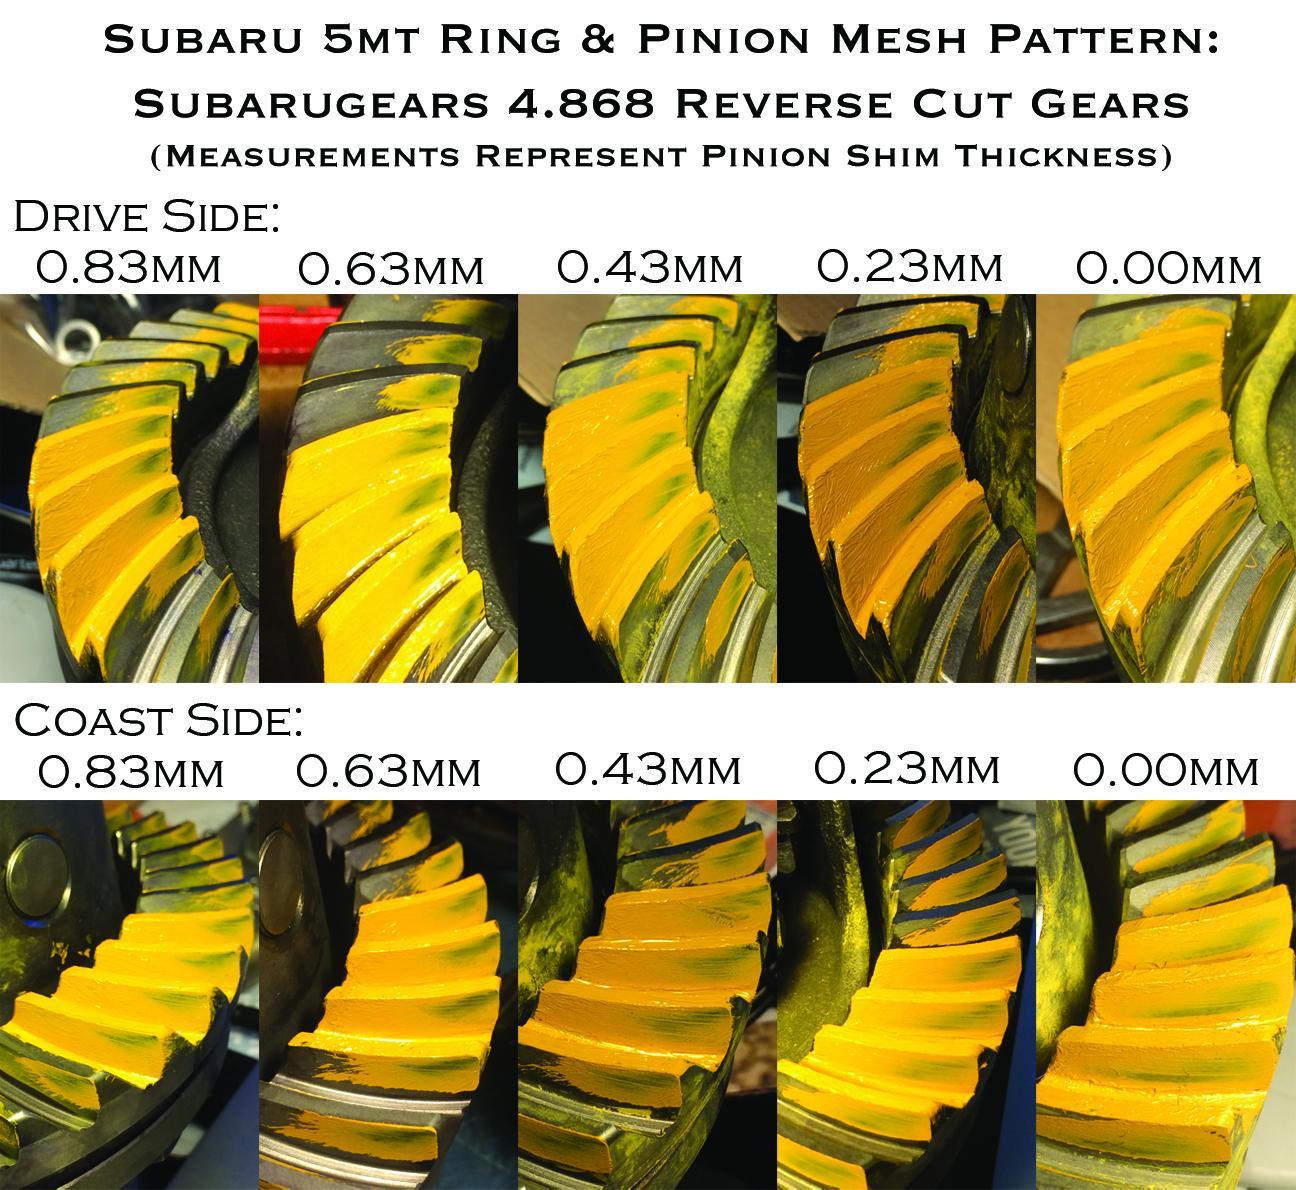 4rdzy Subaru Legacy Wagon Wiring Diagram 91 Radio in addition Jeep Cherokee Headlight Switch Wiring Diagram furthermore Nissan 300zx Parts Diagram moreover Subaru Forester Parts Diagram Seat as well Edge Radio Wiring Illumination 2010. on subaru svx wiring harness